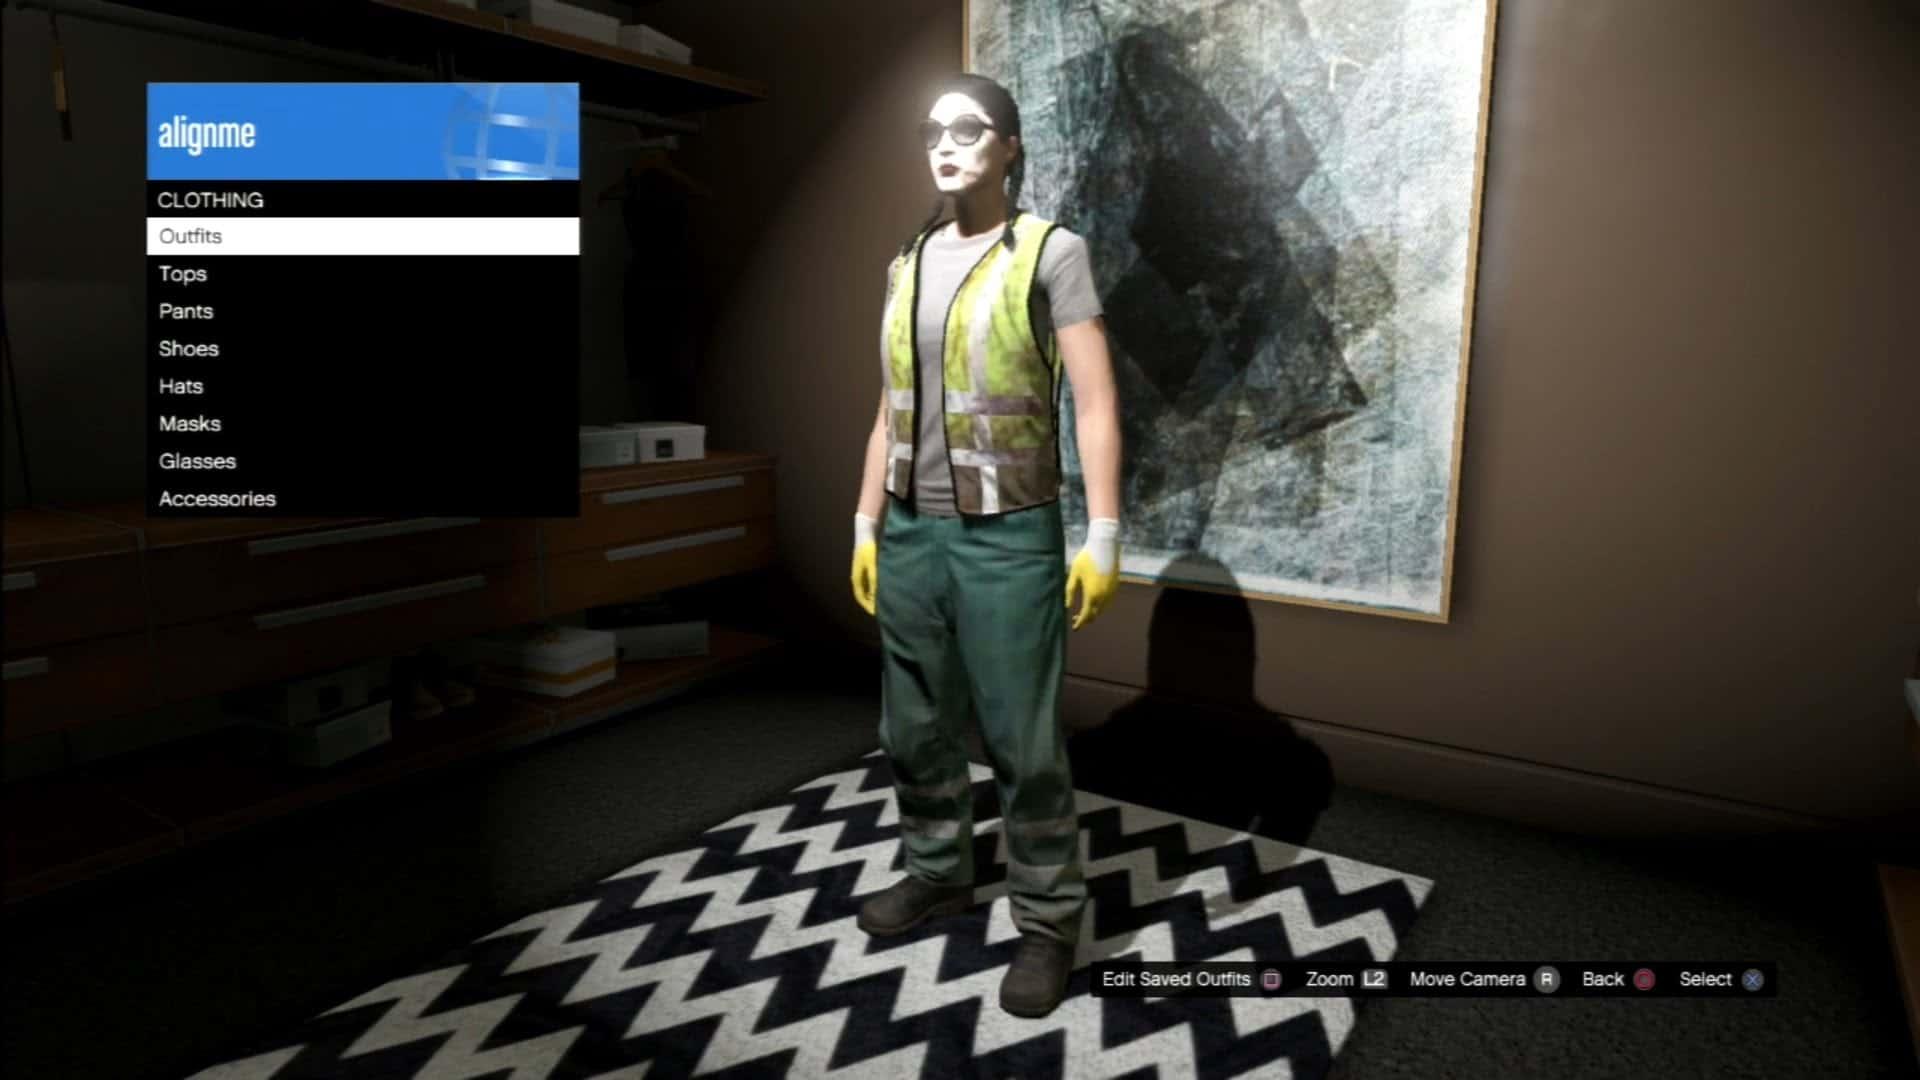 GTA Online's Ultimate Outfit Saving Method - GTA BOOM